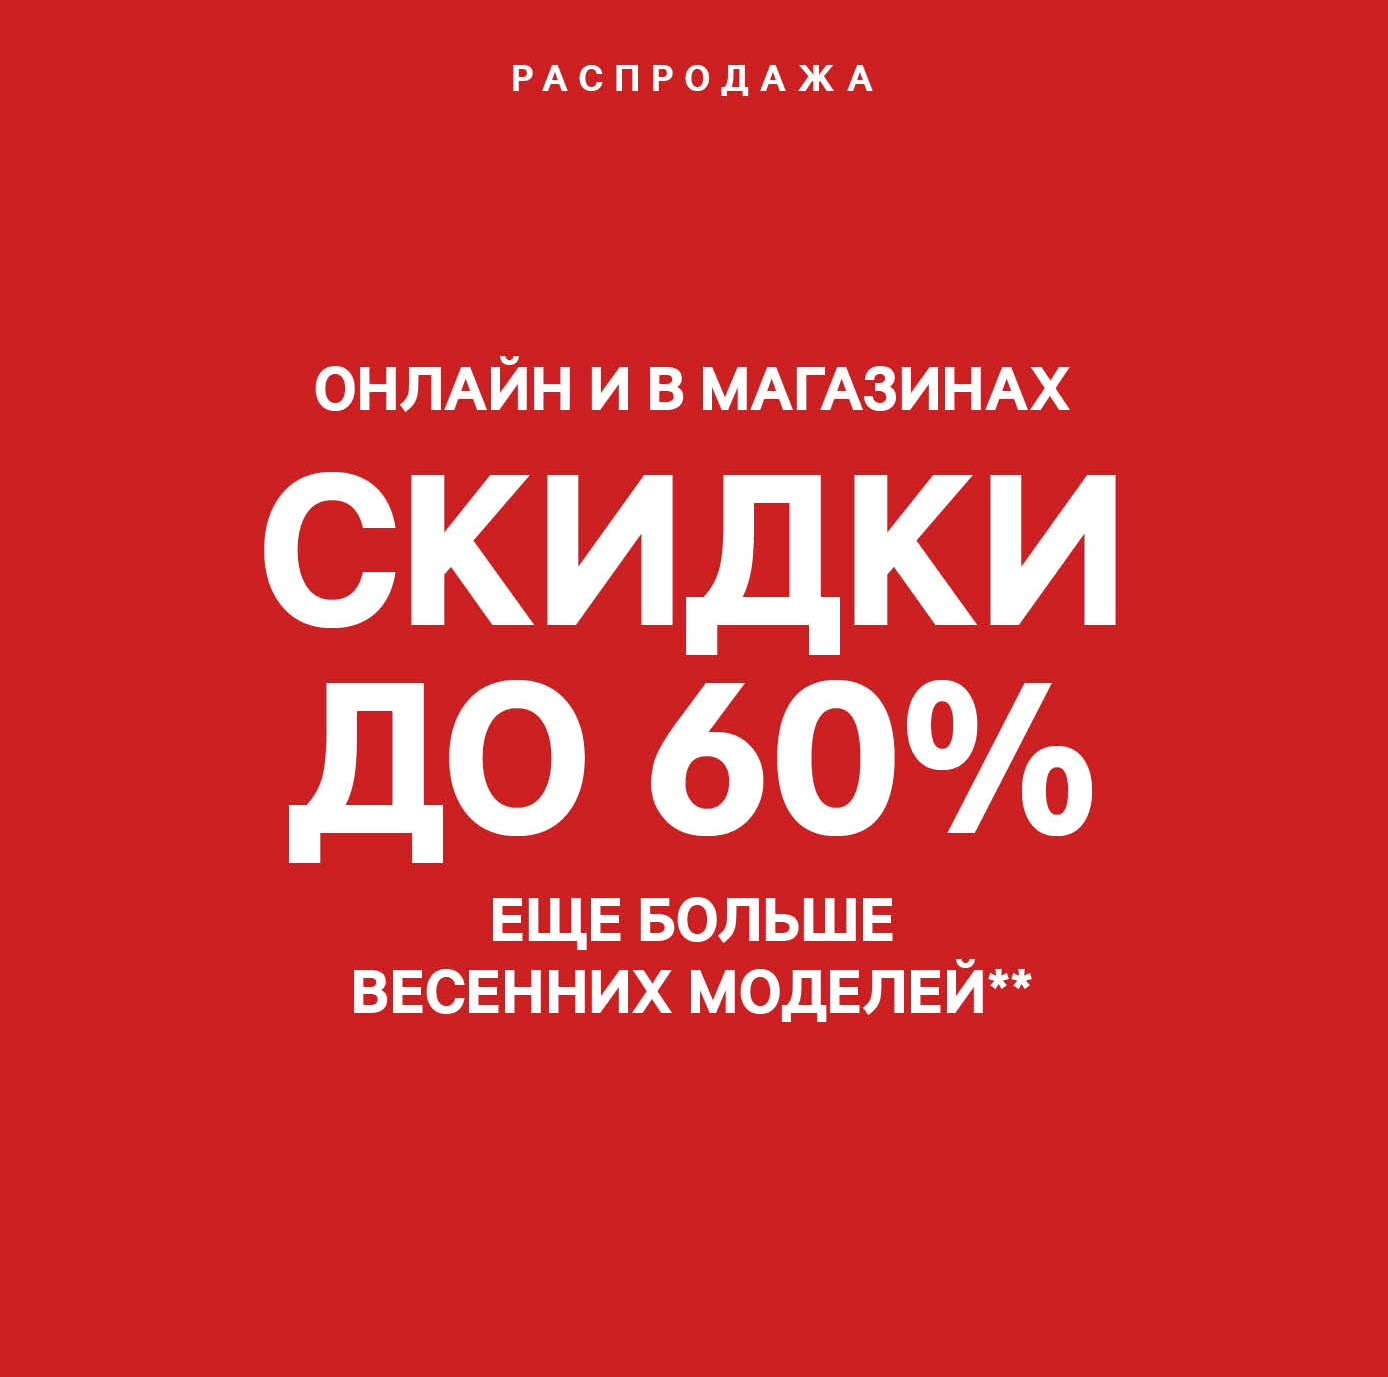 Онлайн Распродажи